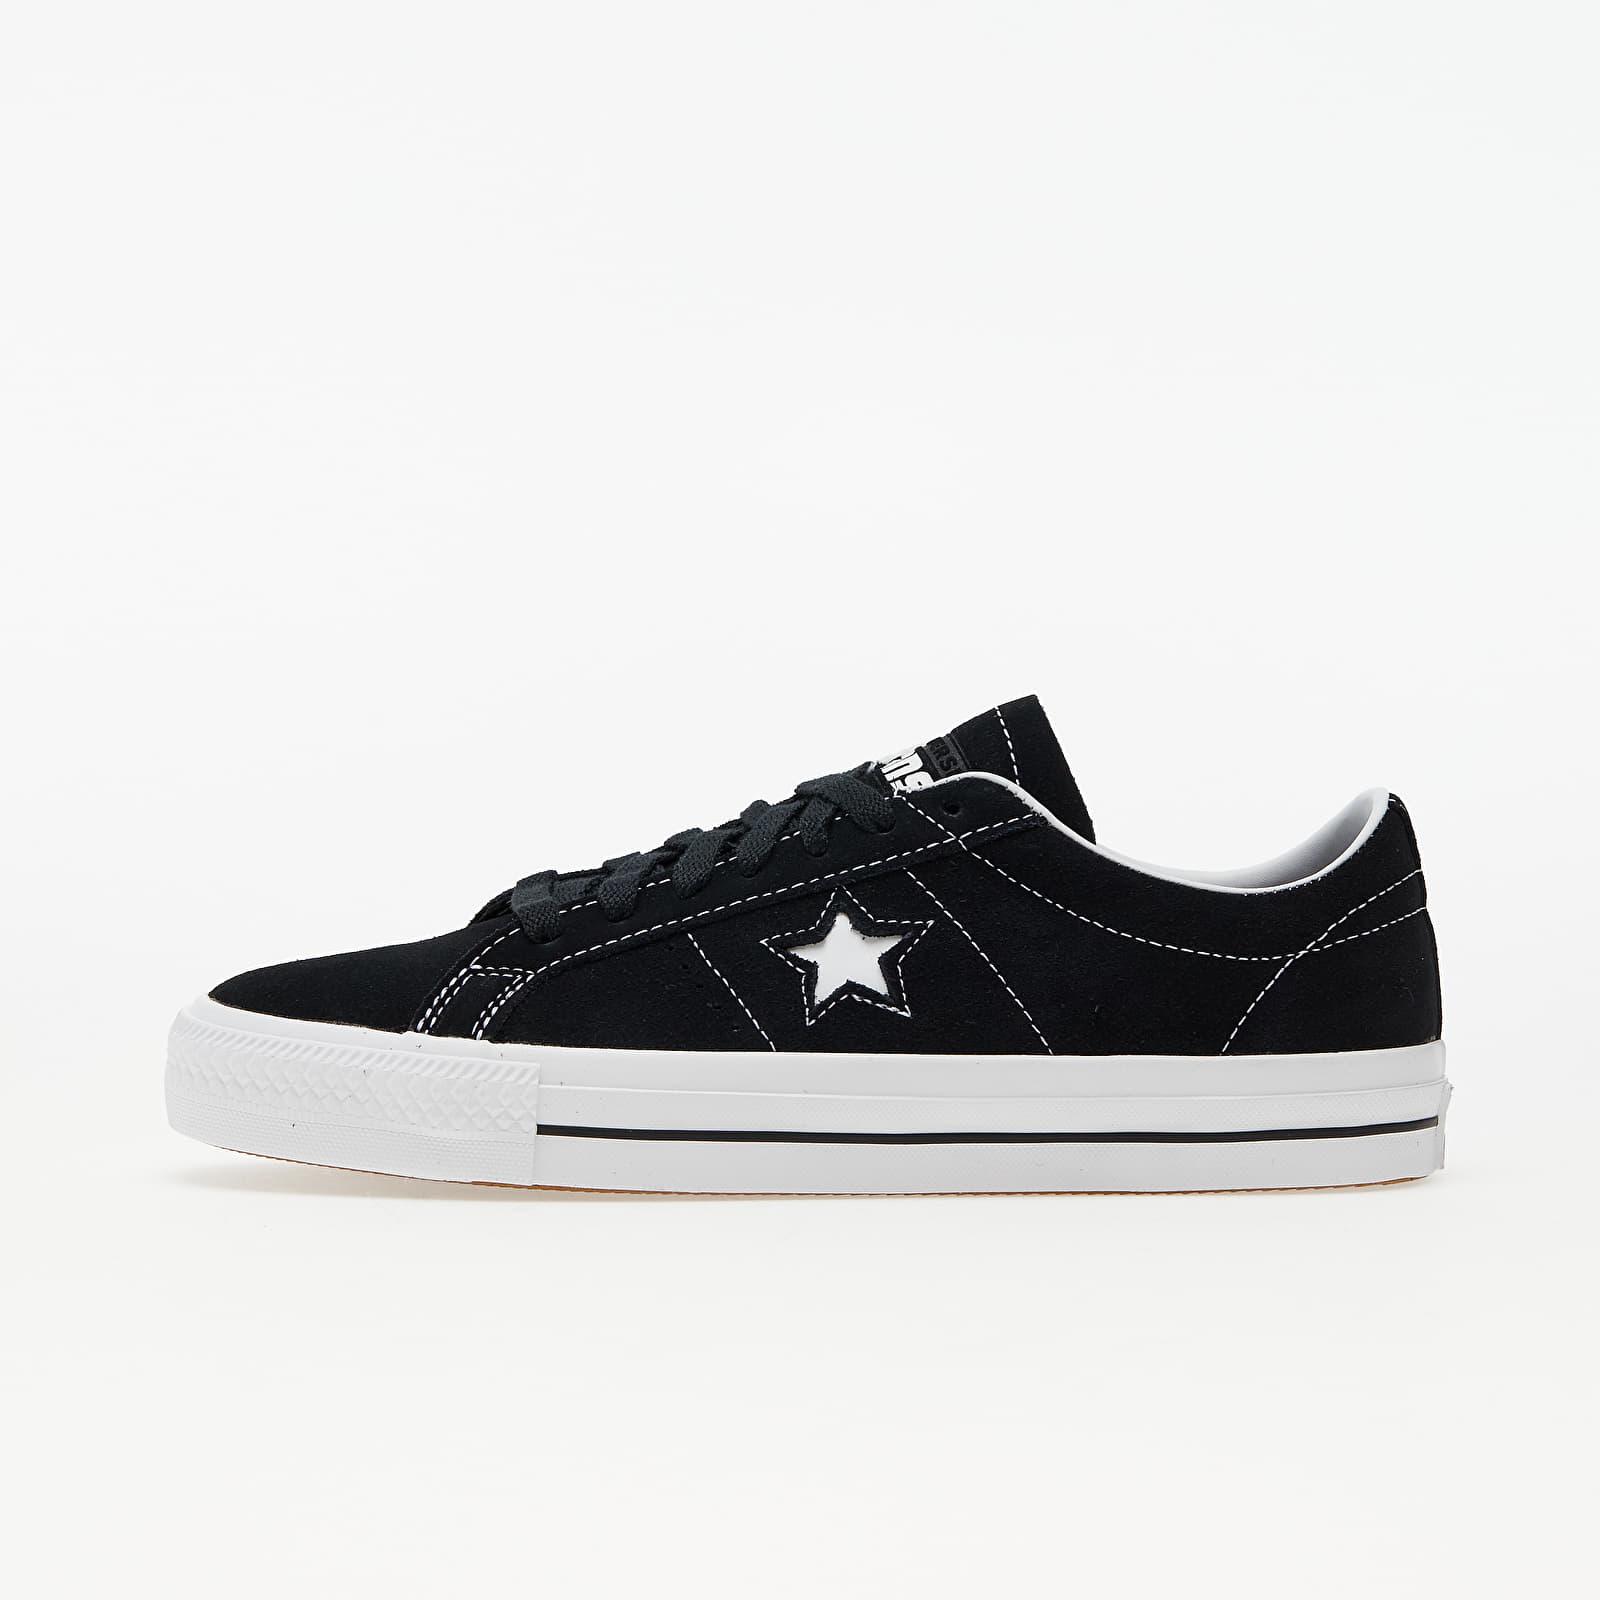 Converse One Star Pro (Refinement) Black/ White/ White 159579C